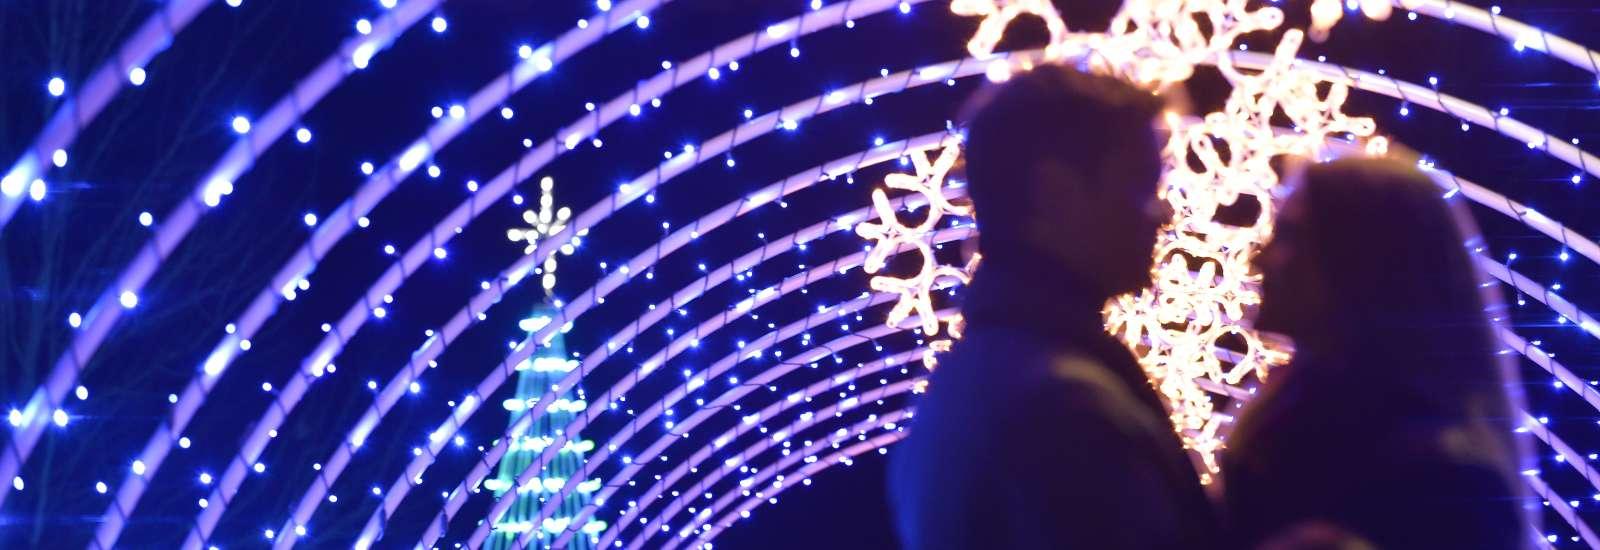 Winter Lights at the NC Arboretum